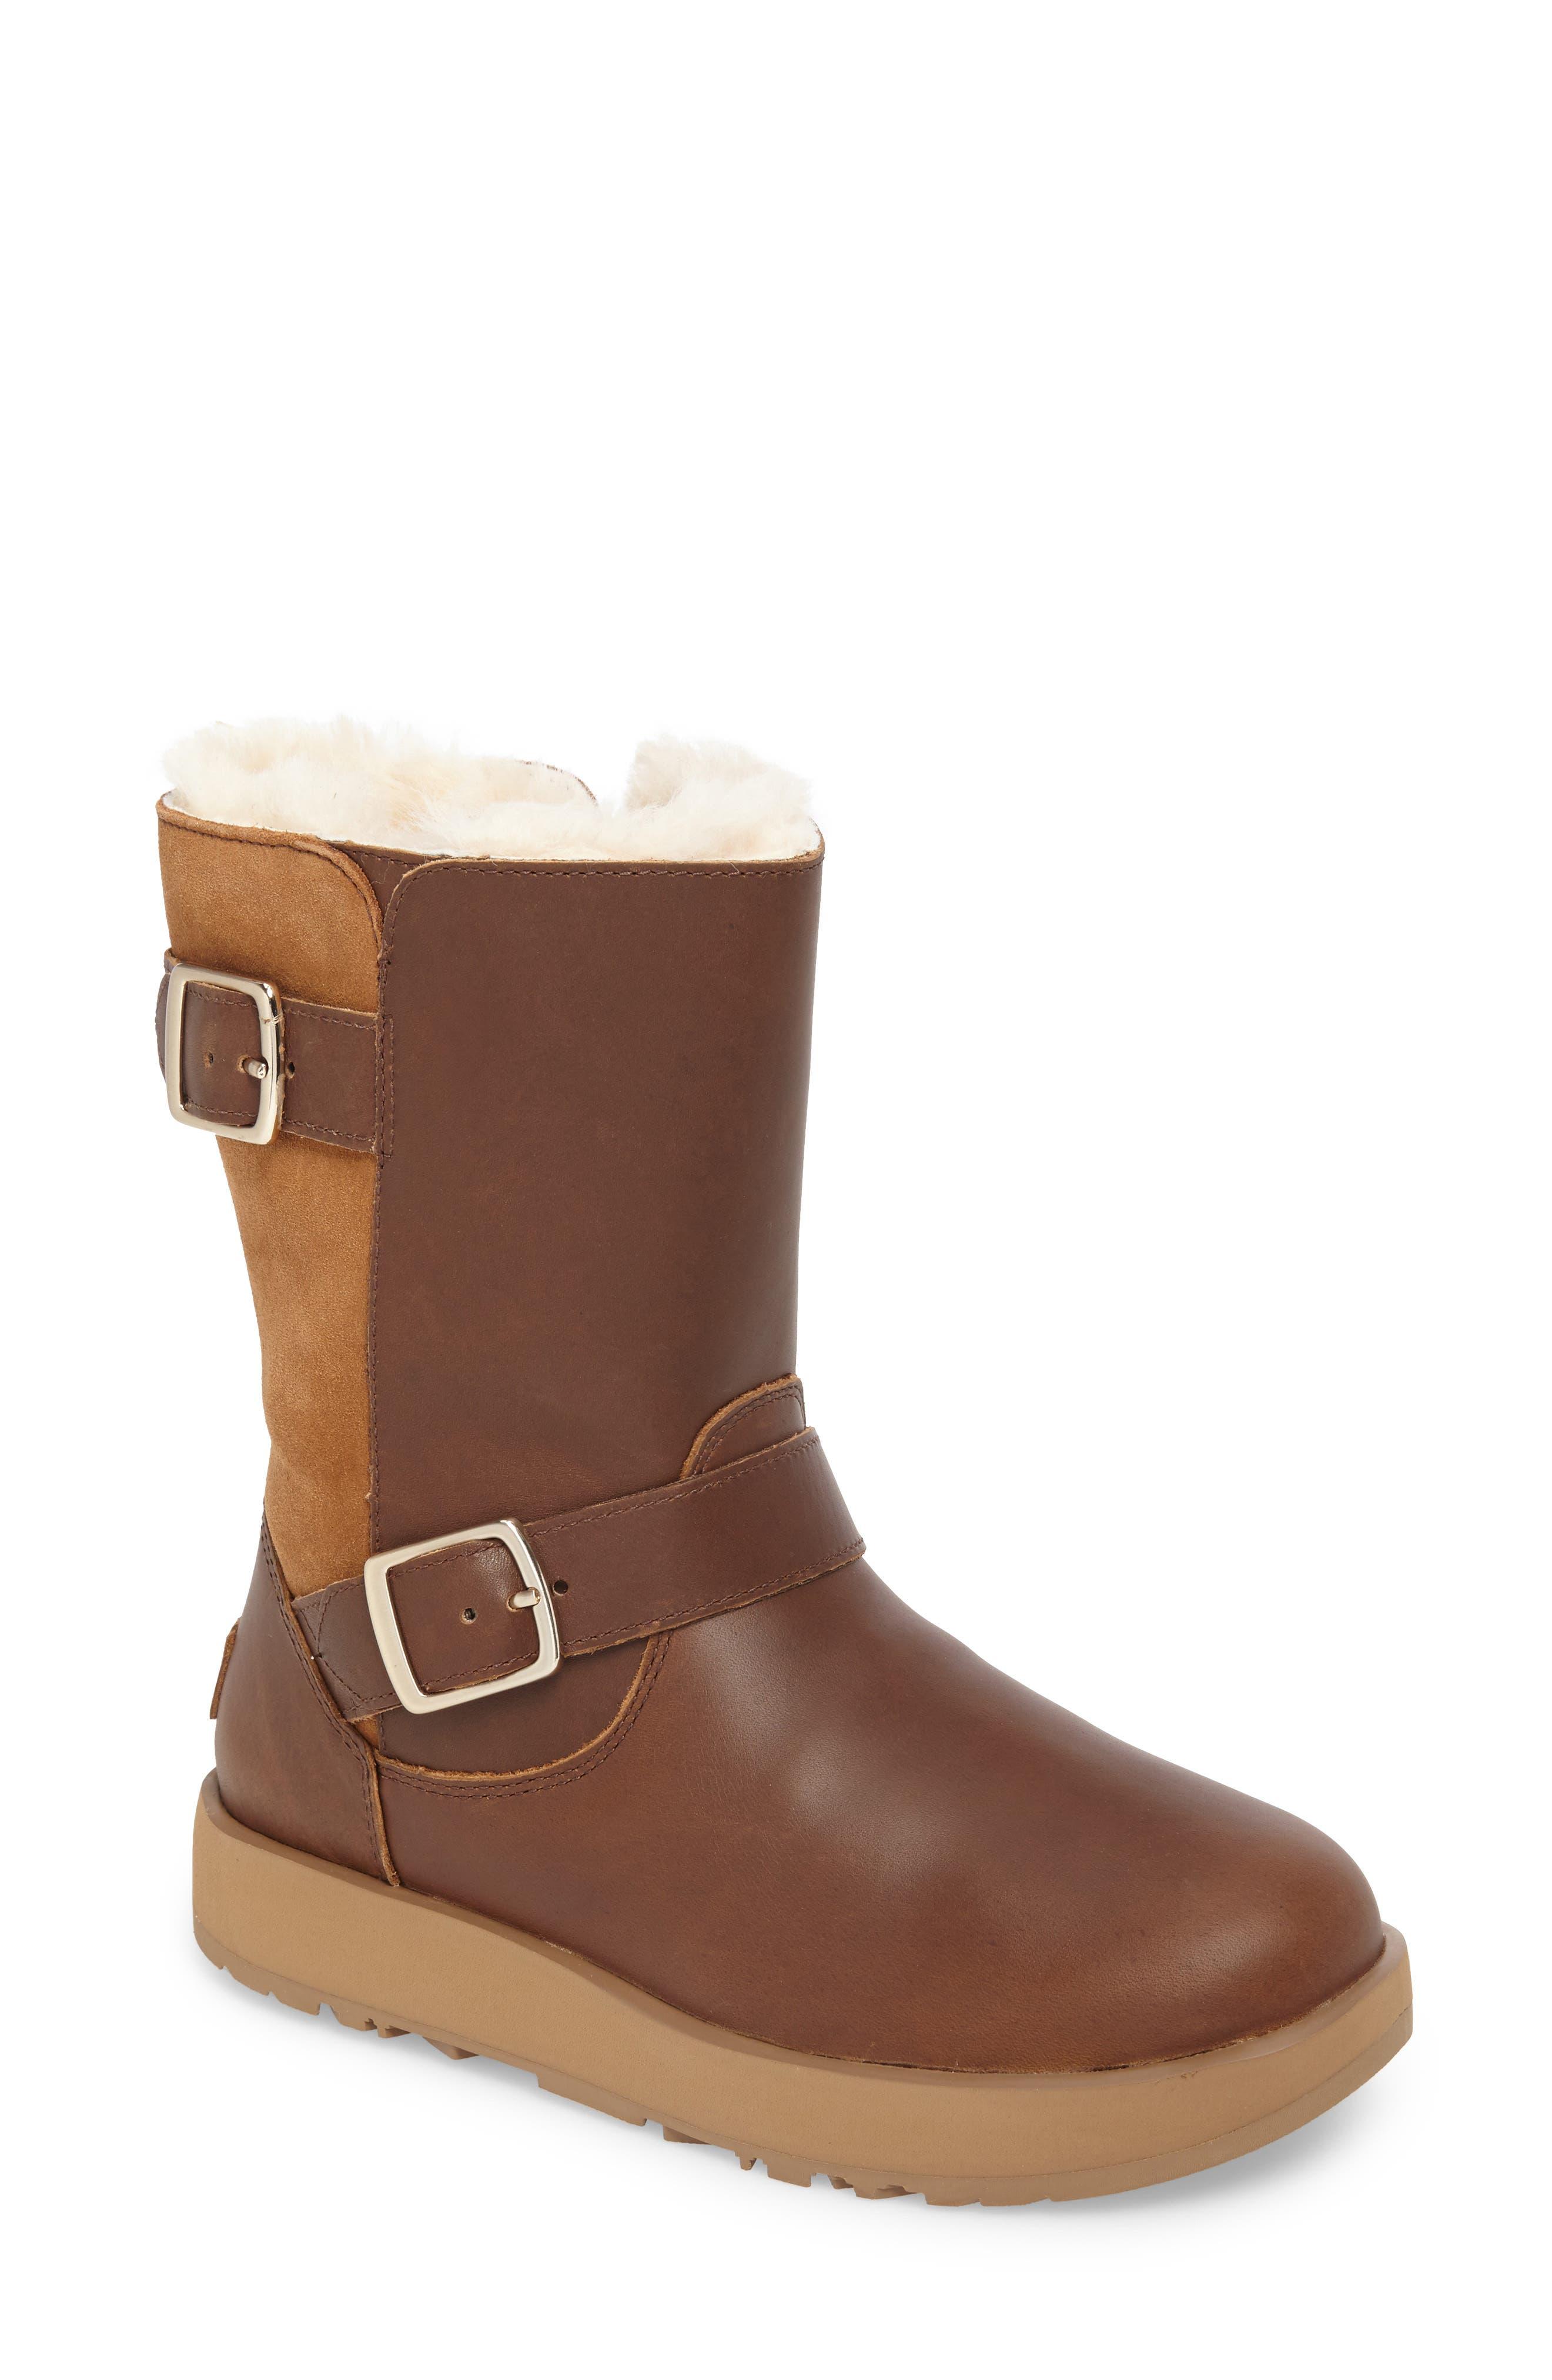 Alternate Image 1 Selected - UGG® Breida Waterproof Boot (Women)